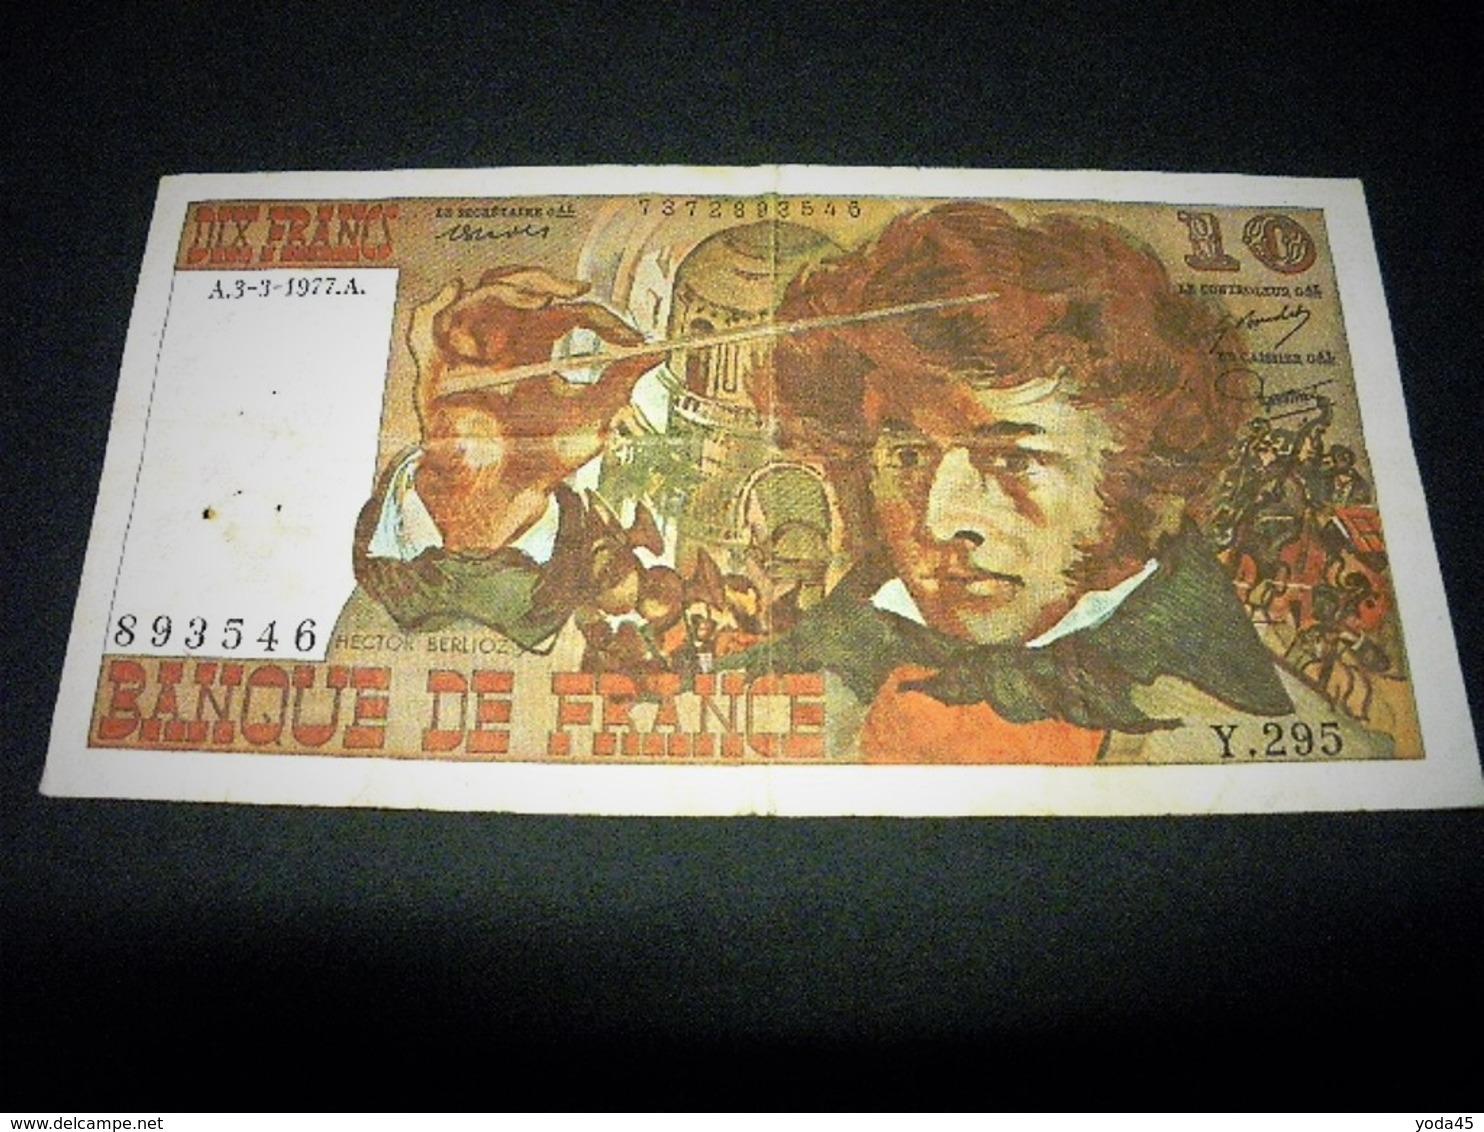 FRANCE 10 Francs 03/03/1977 , Pick N° 150 C ,fayette N°21, FRANCIA ,FRANKREICH - 1962-1997 ''Francs''